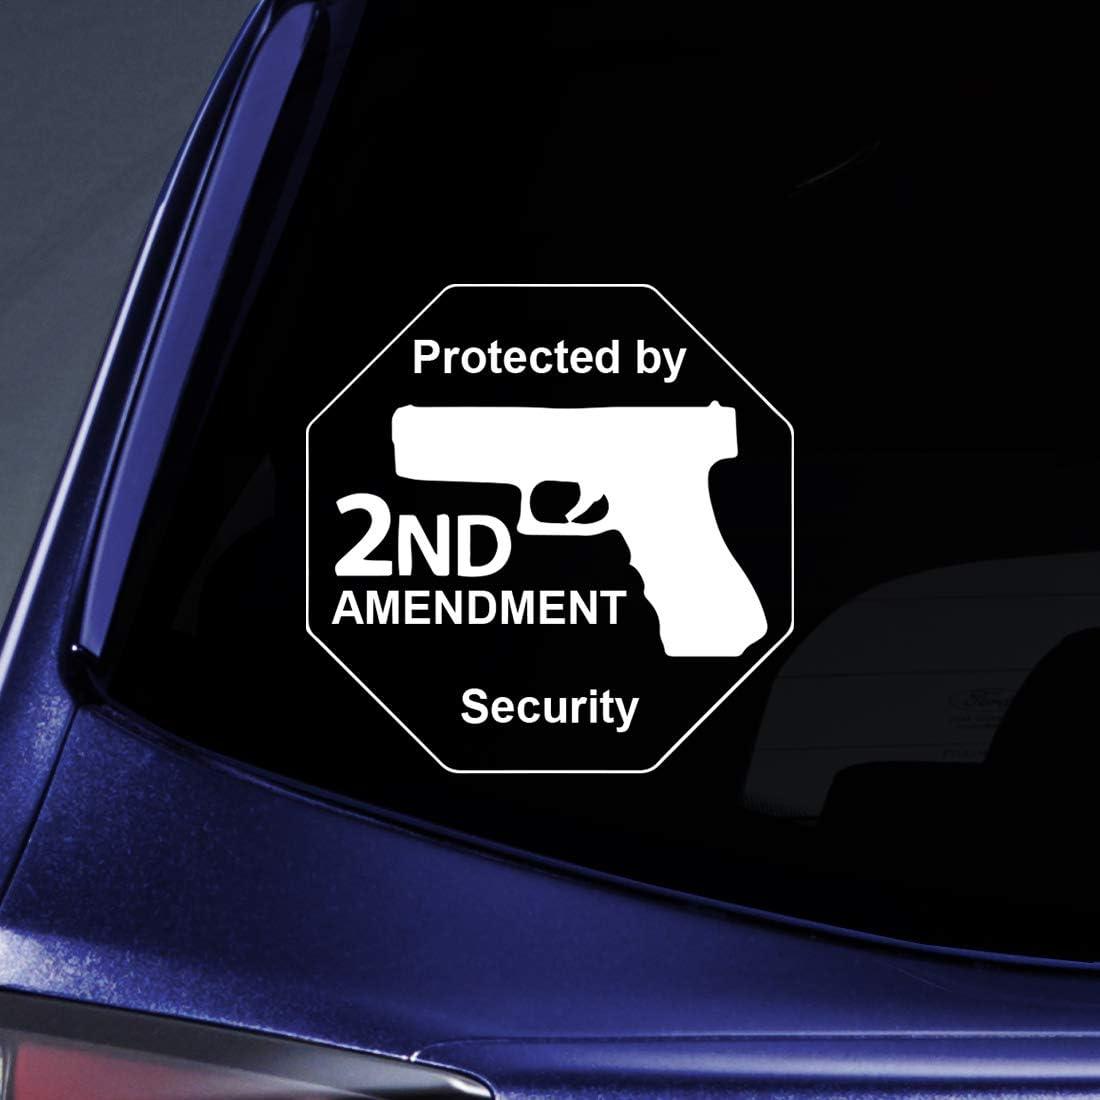 Pro Gun Decal Protected 2nd Amendment Pistol Car Truck Motorcycle Window Sticker